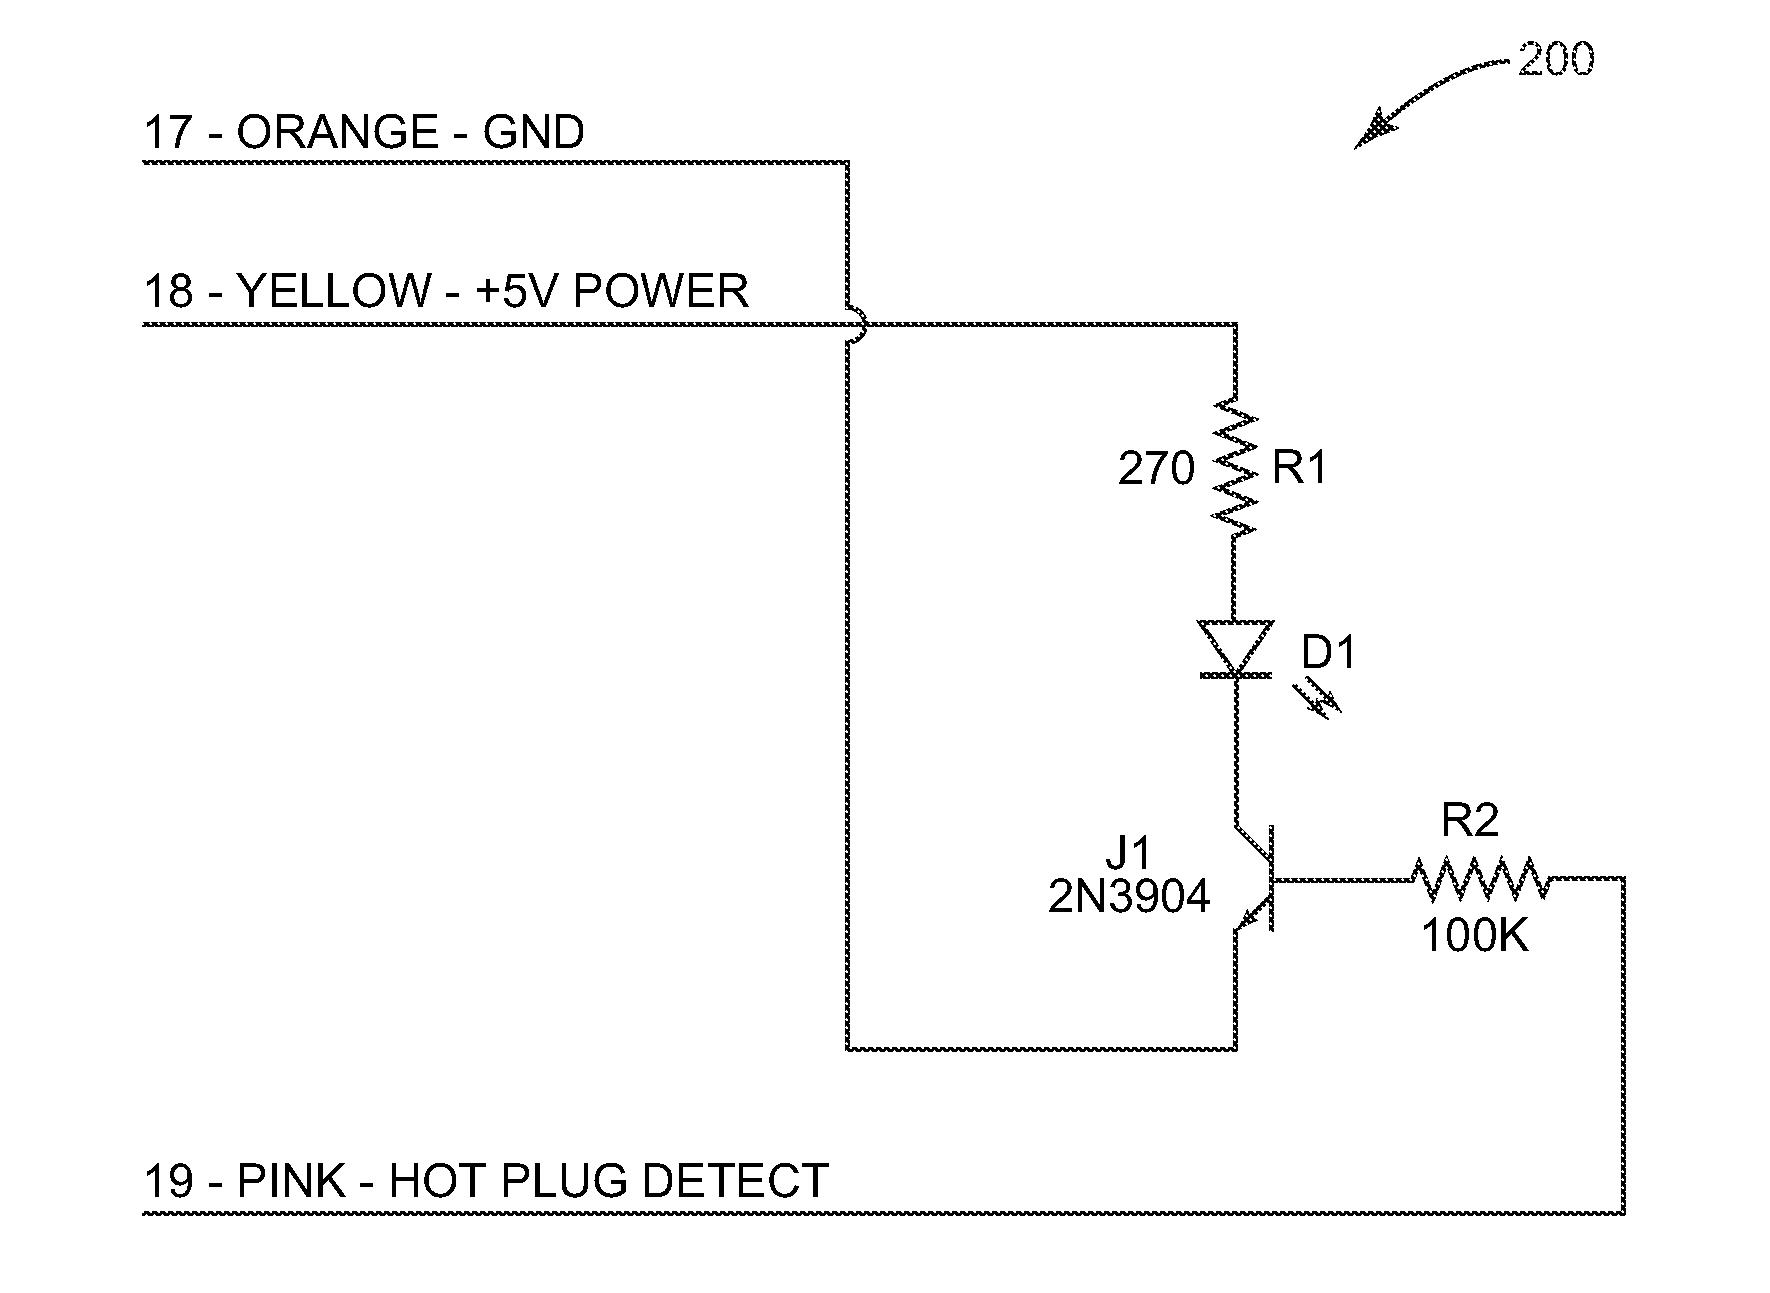 Hdmi Hot Plug Detect Wiring Diagram Trusted Wiring Diagram